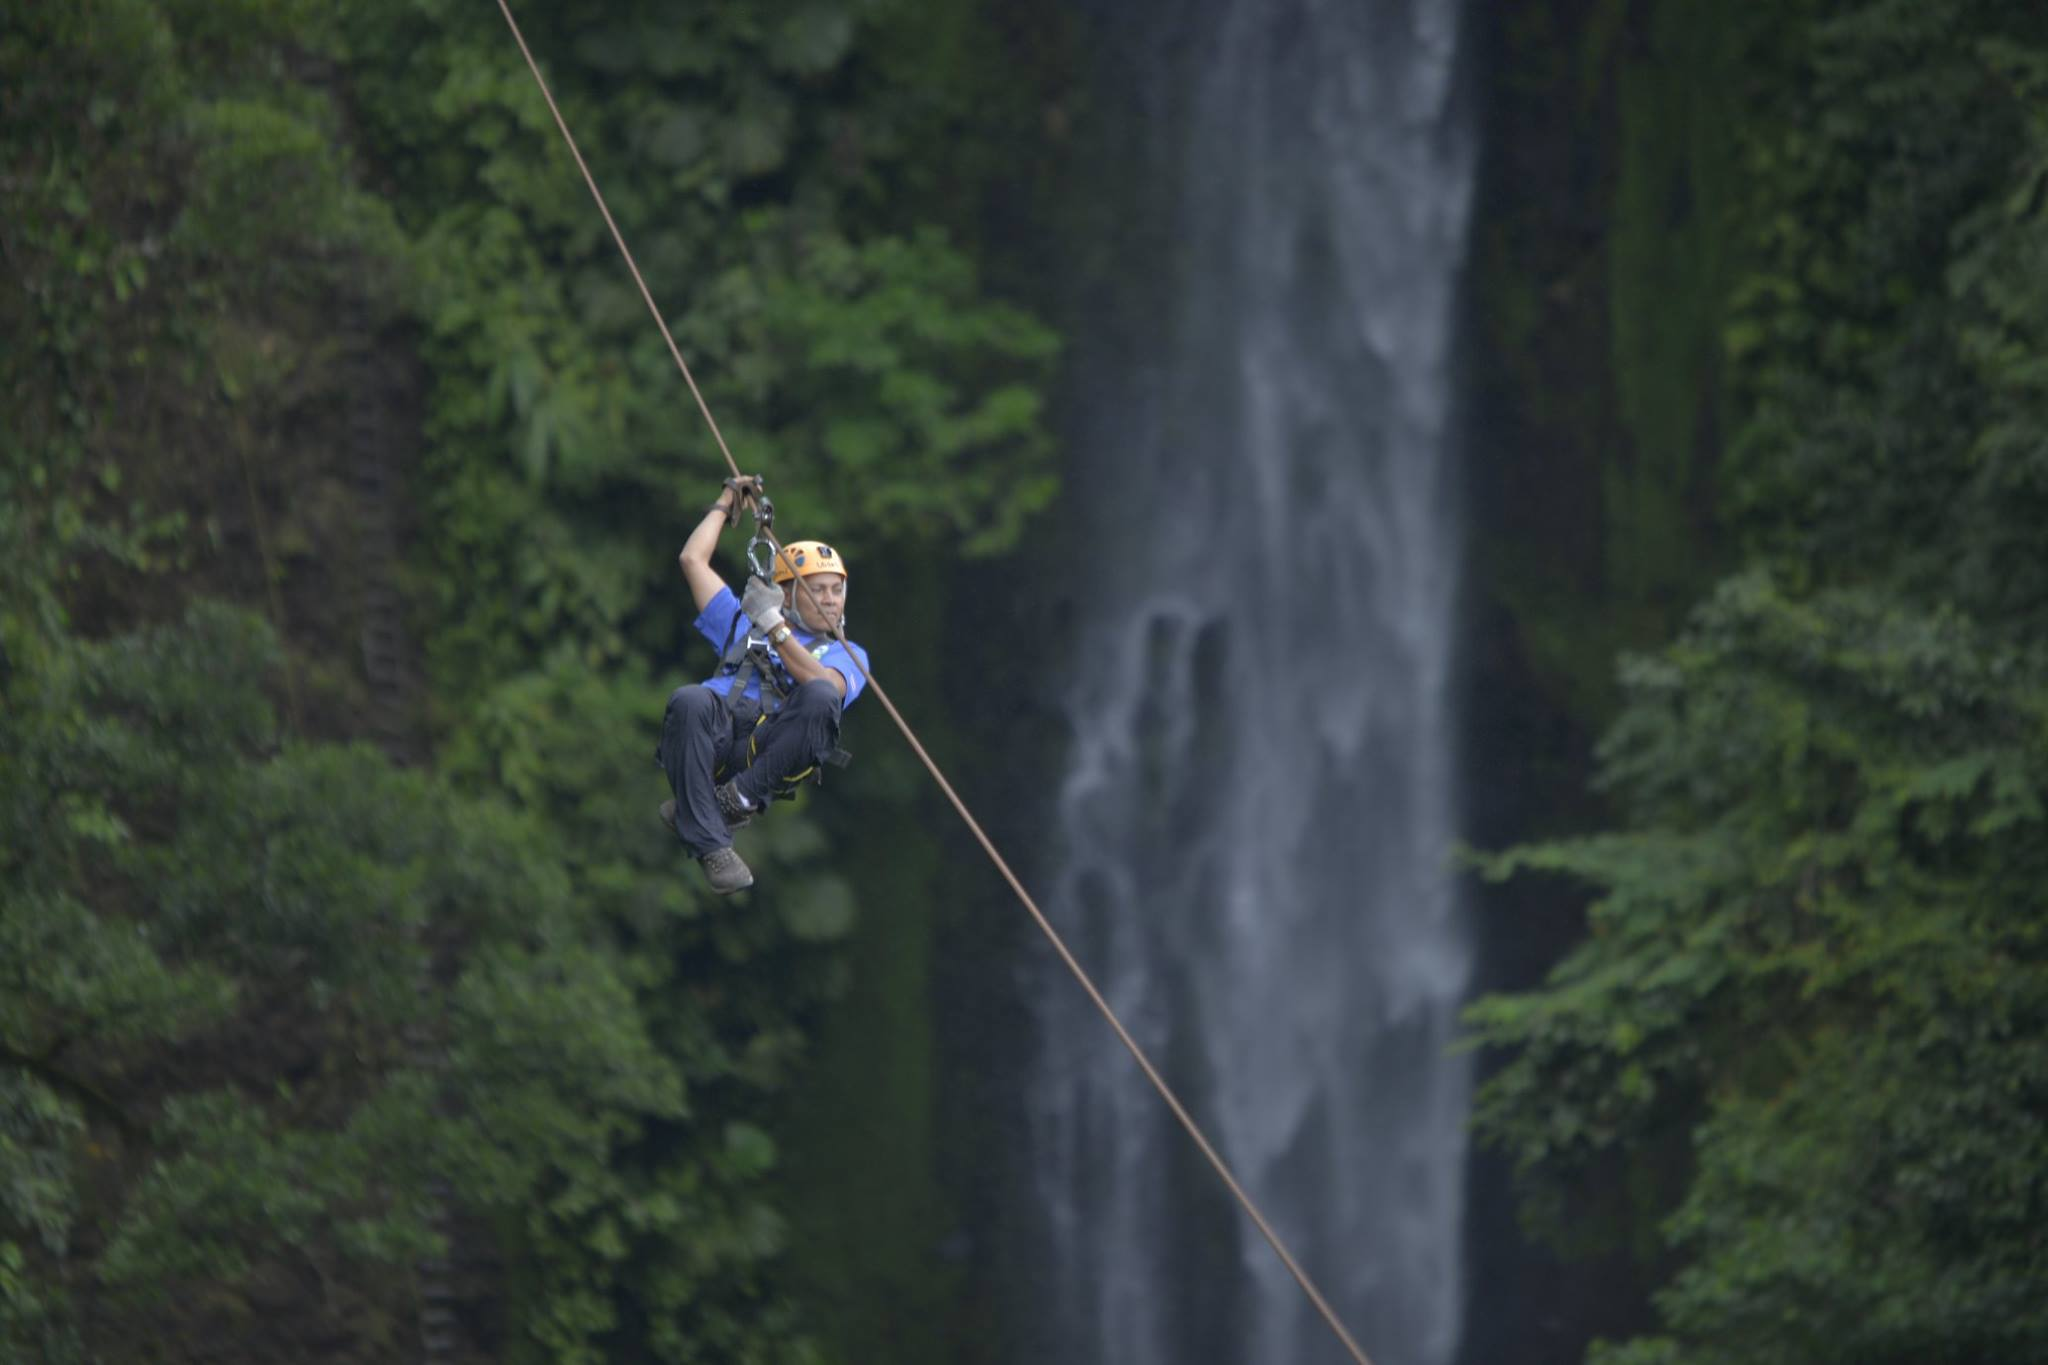 La Fortuna Arenal zip Line Canopy Tour